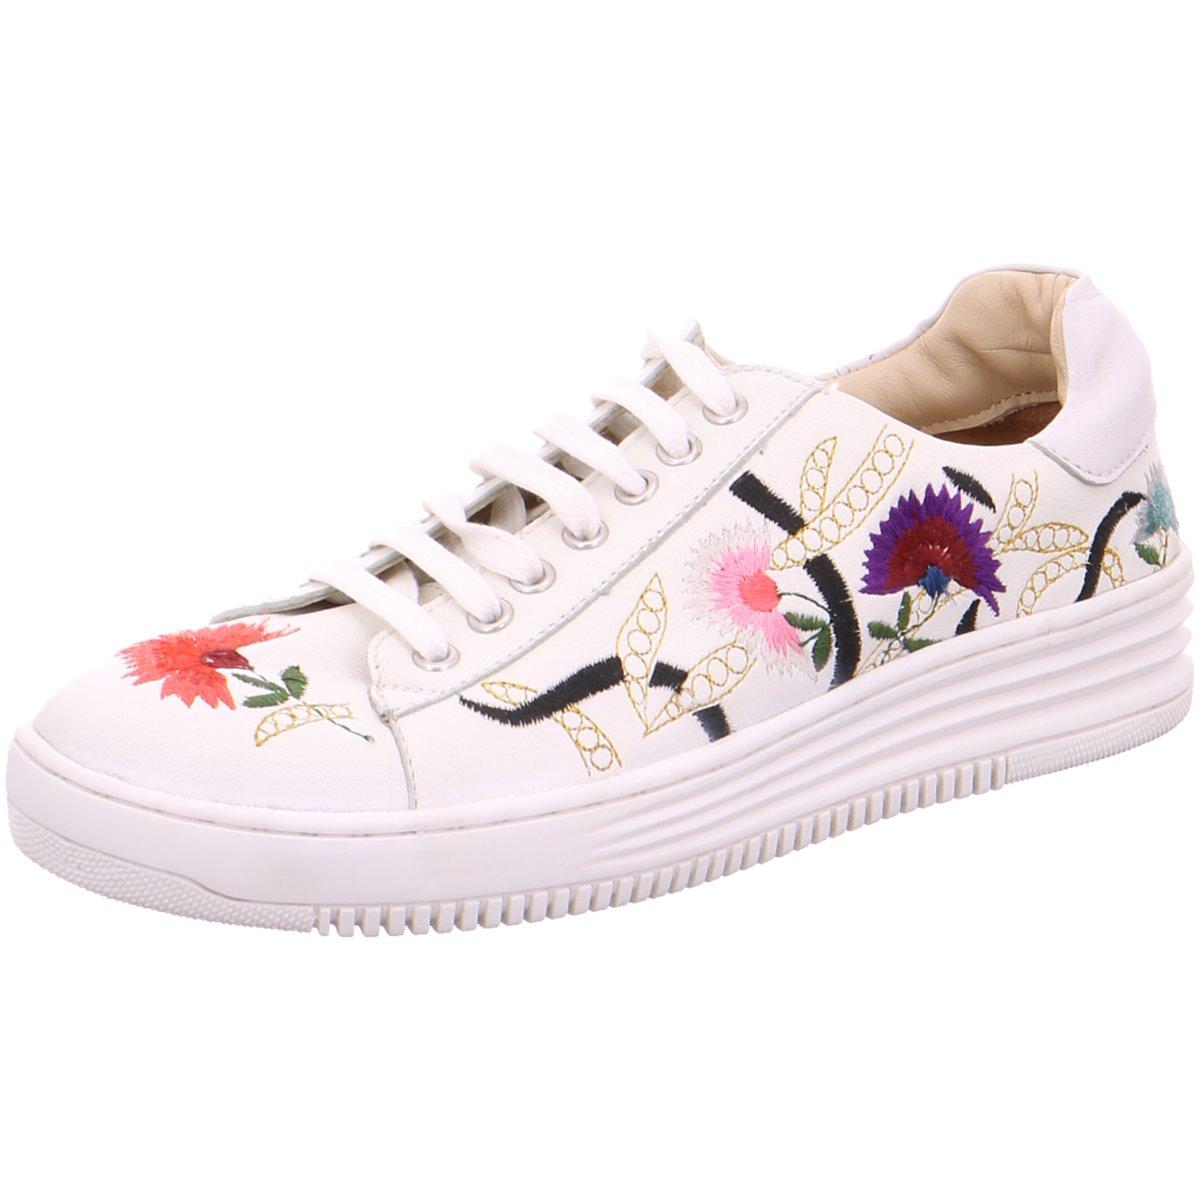 Lazamani Sneaker 53 Weiß 304474 Damen 357 OZPukXi